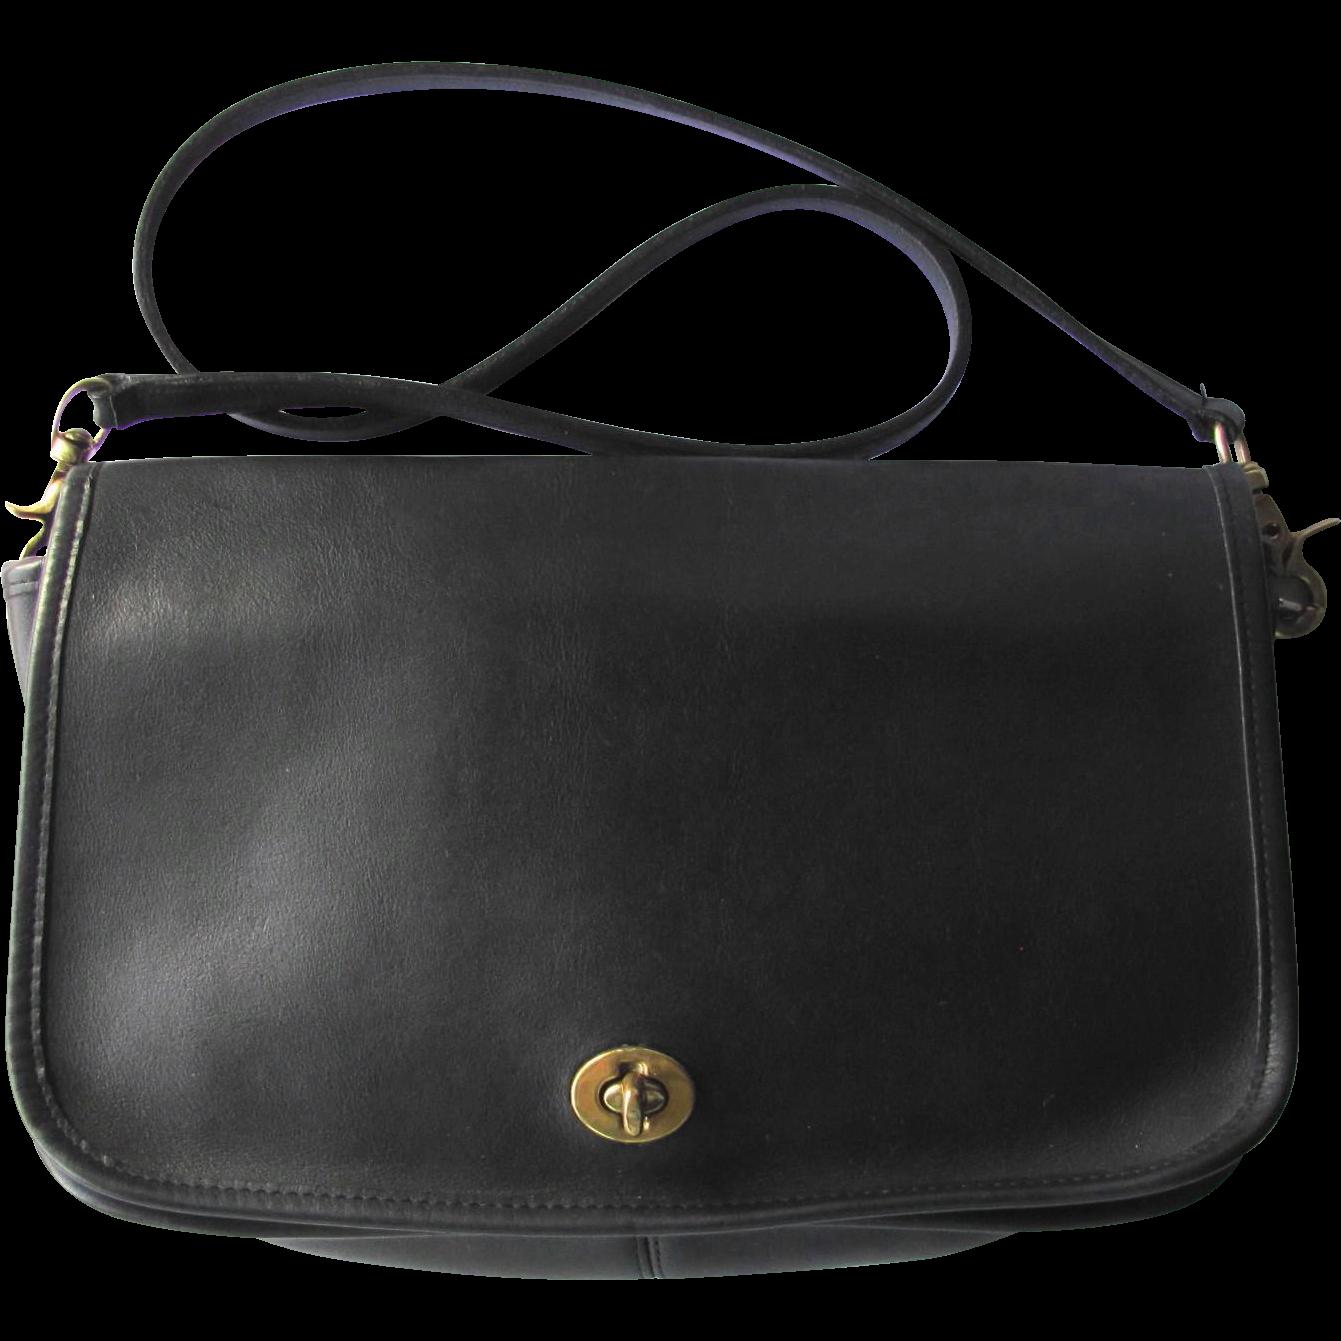 Vintage Coach Black Leather Saddle Bag – New York City Bag ... Saddle Bag